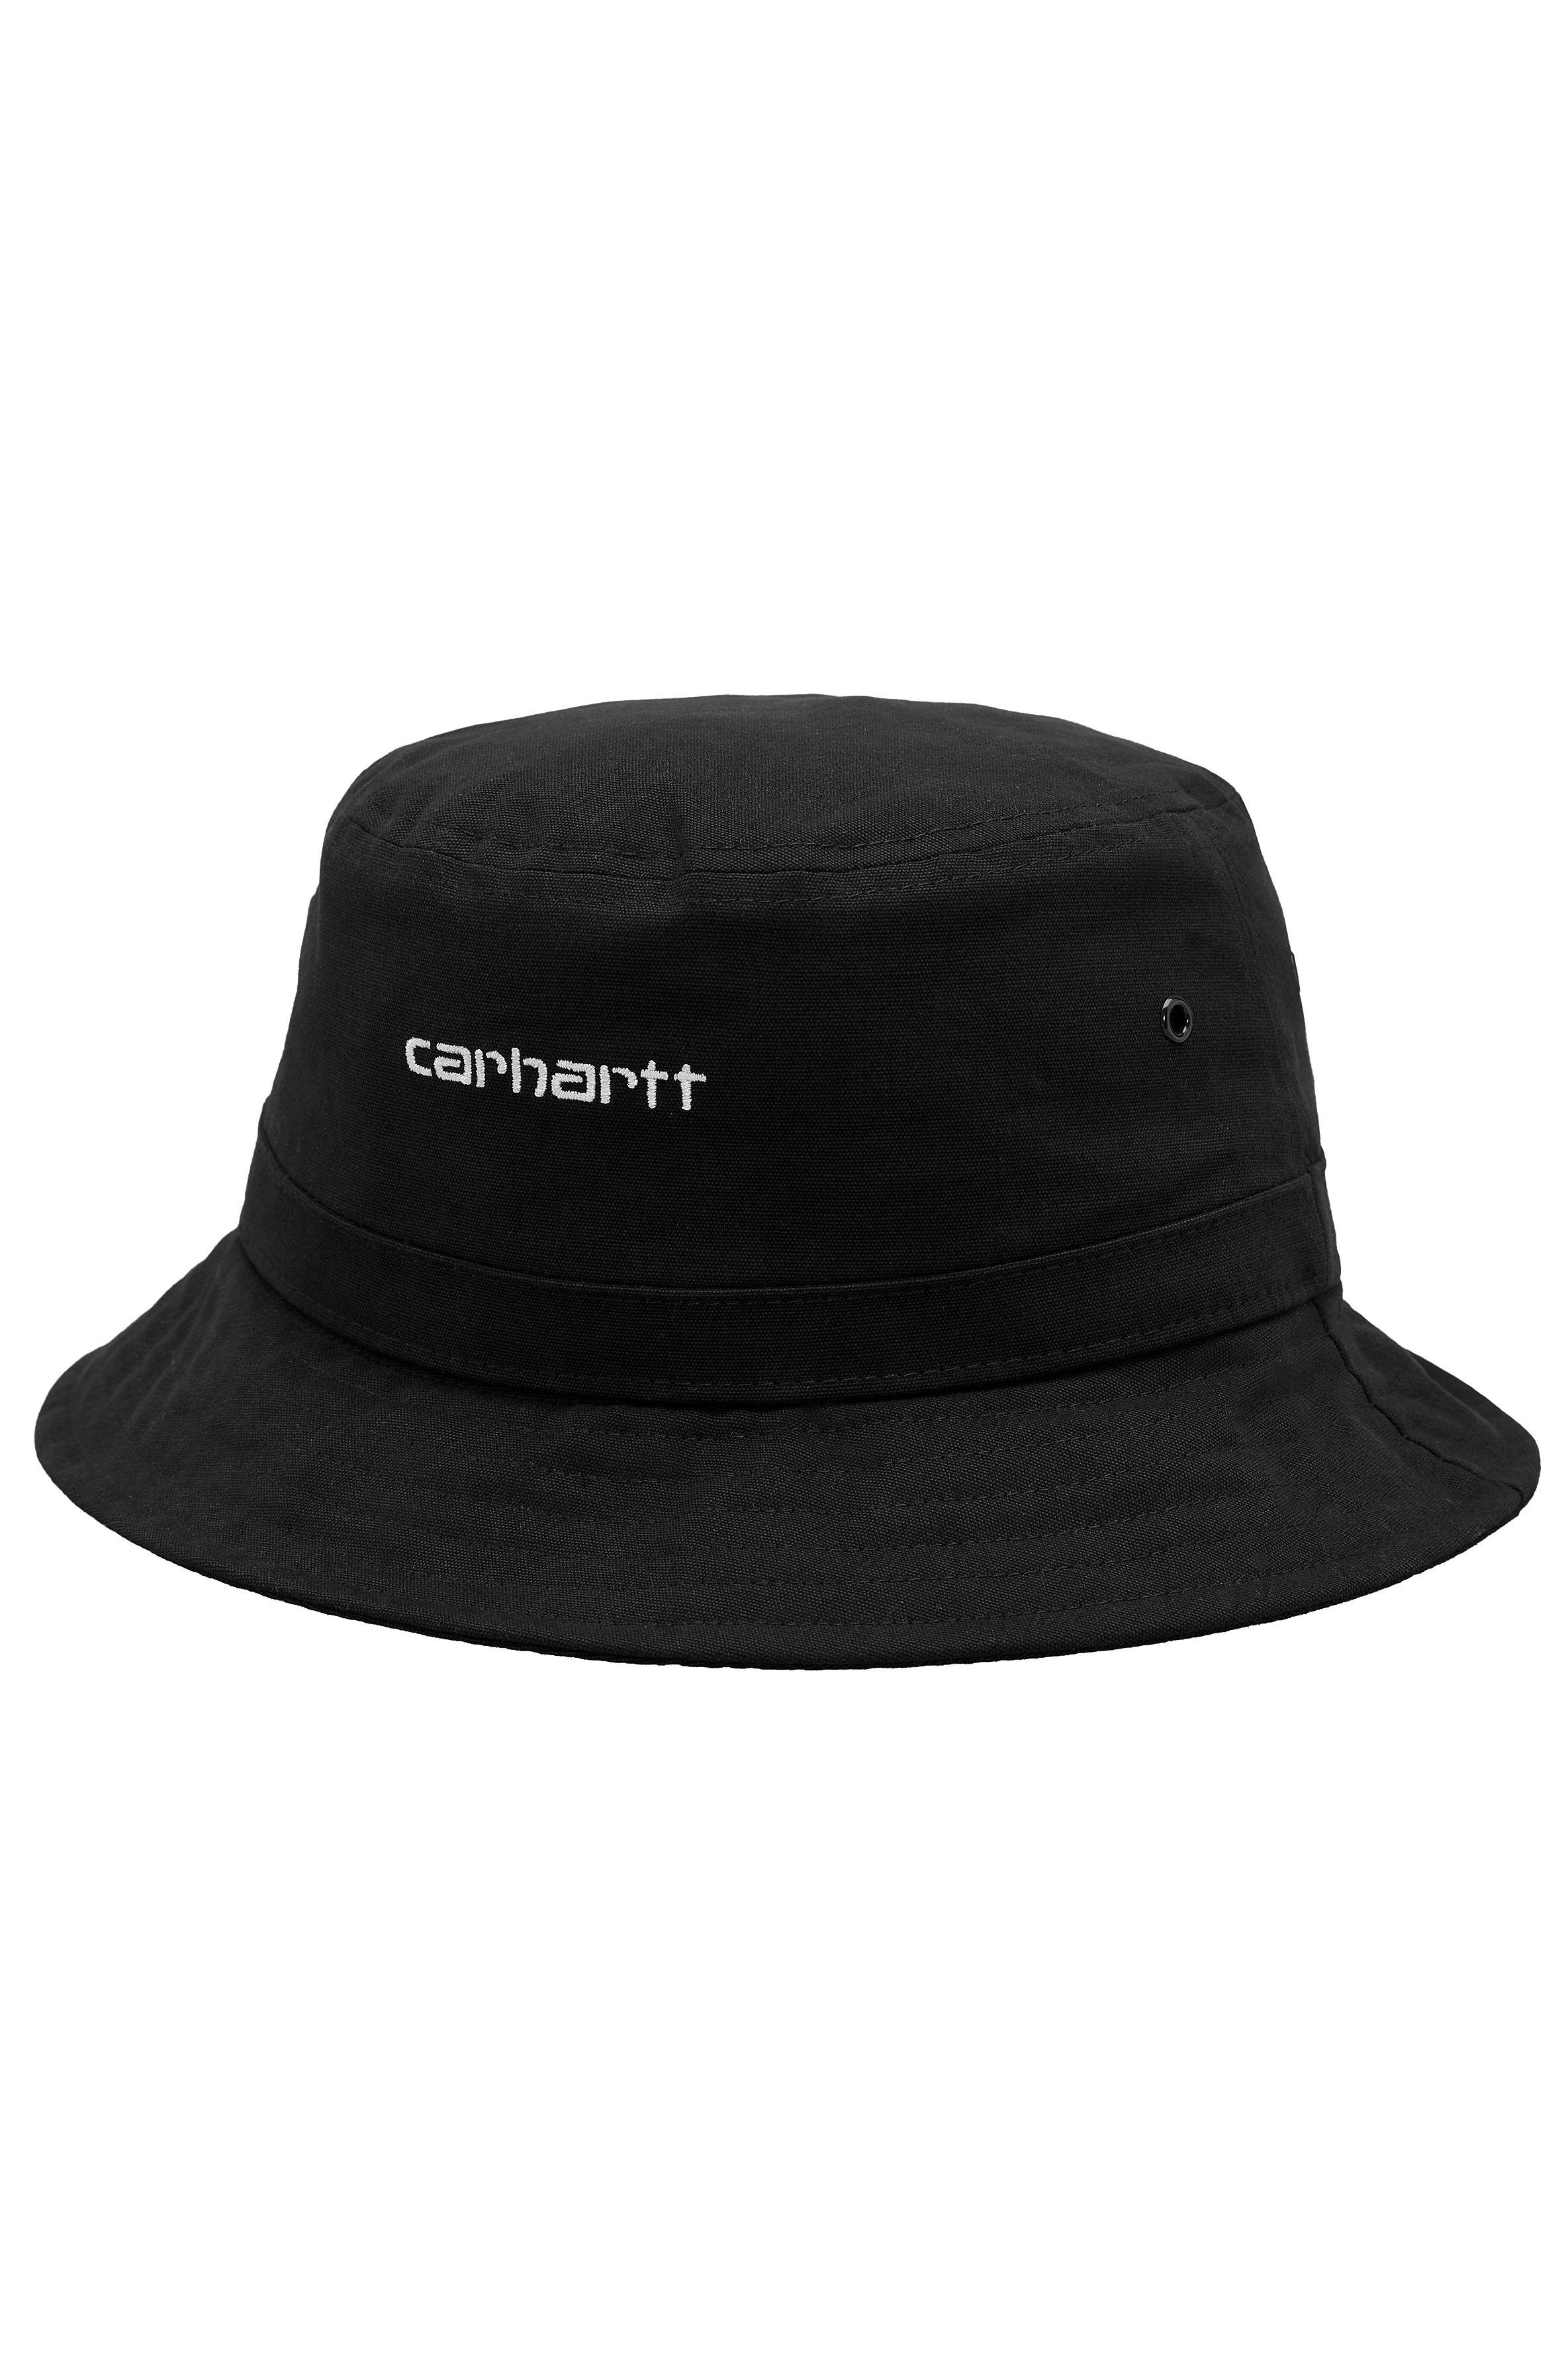 Carhartt WIP Cap SCRIPT BUCKET Black/White